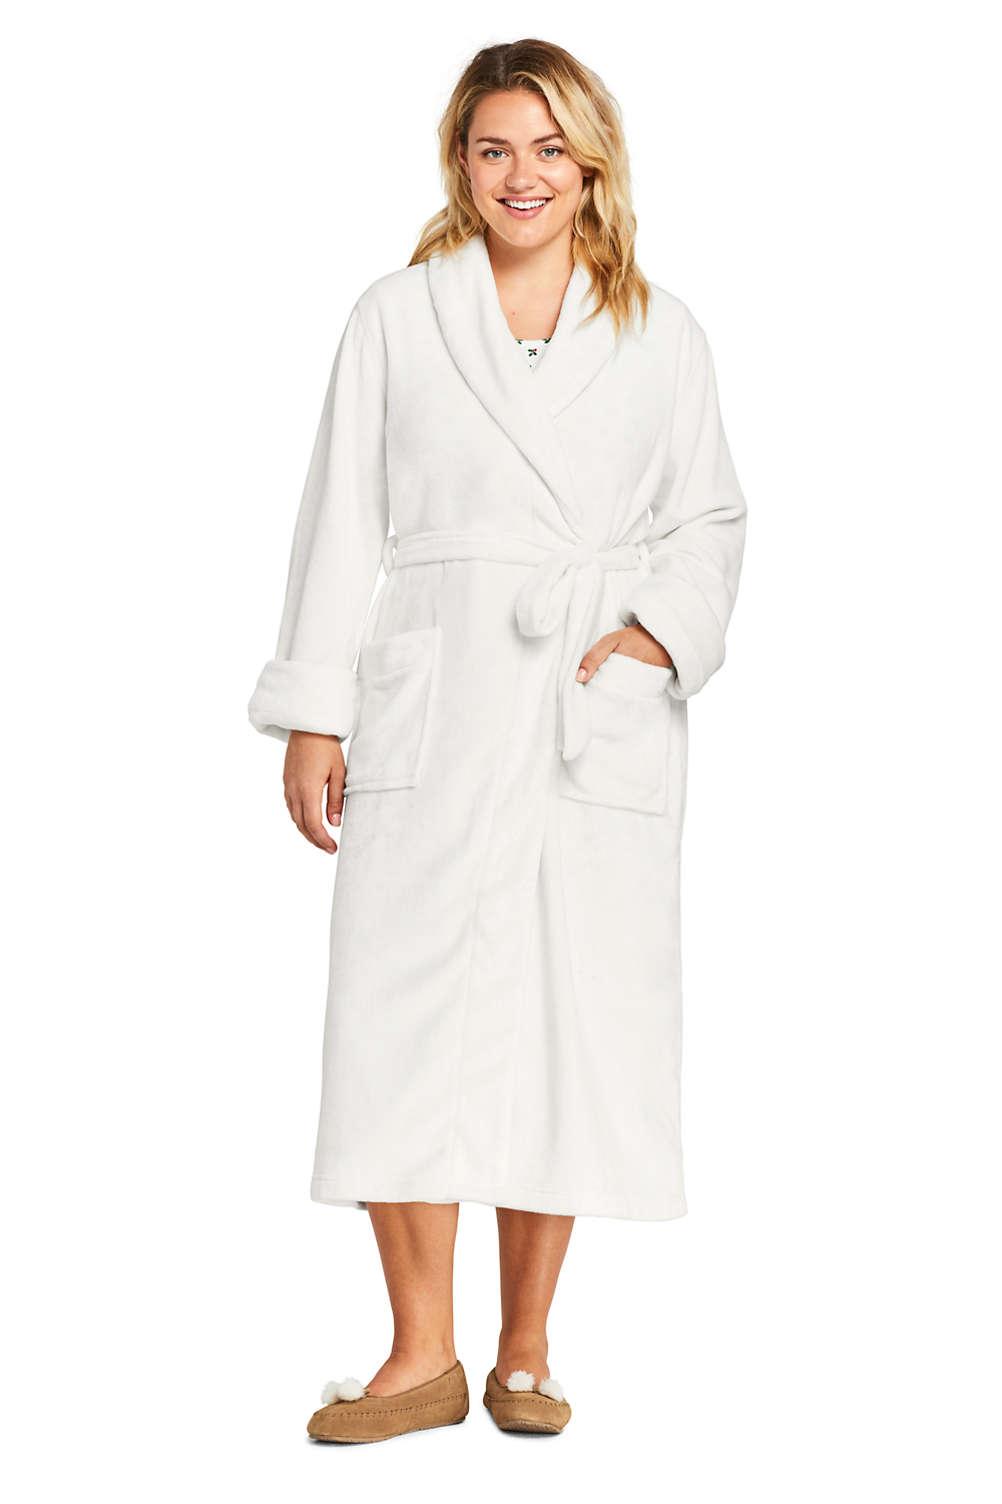 59efb02135e0 Women's Plus Size Plush Fleece Long Robe from Lands' End